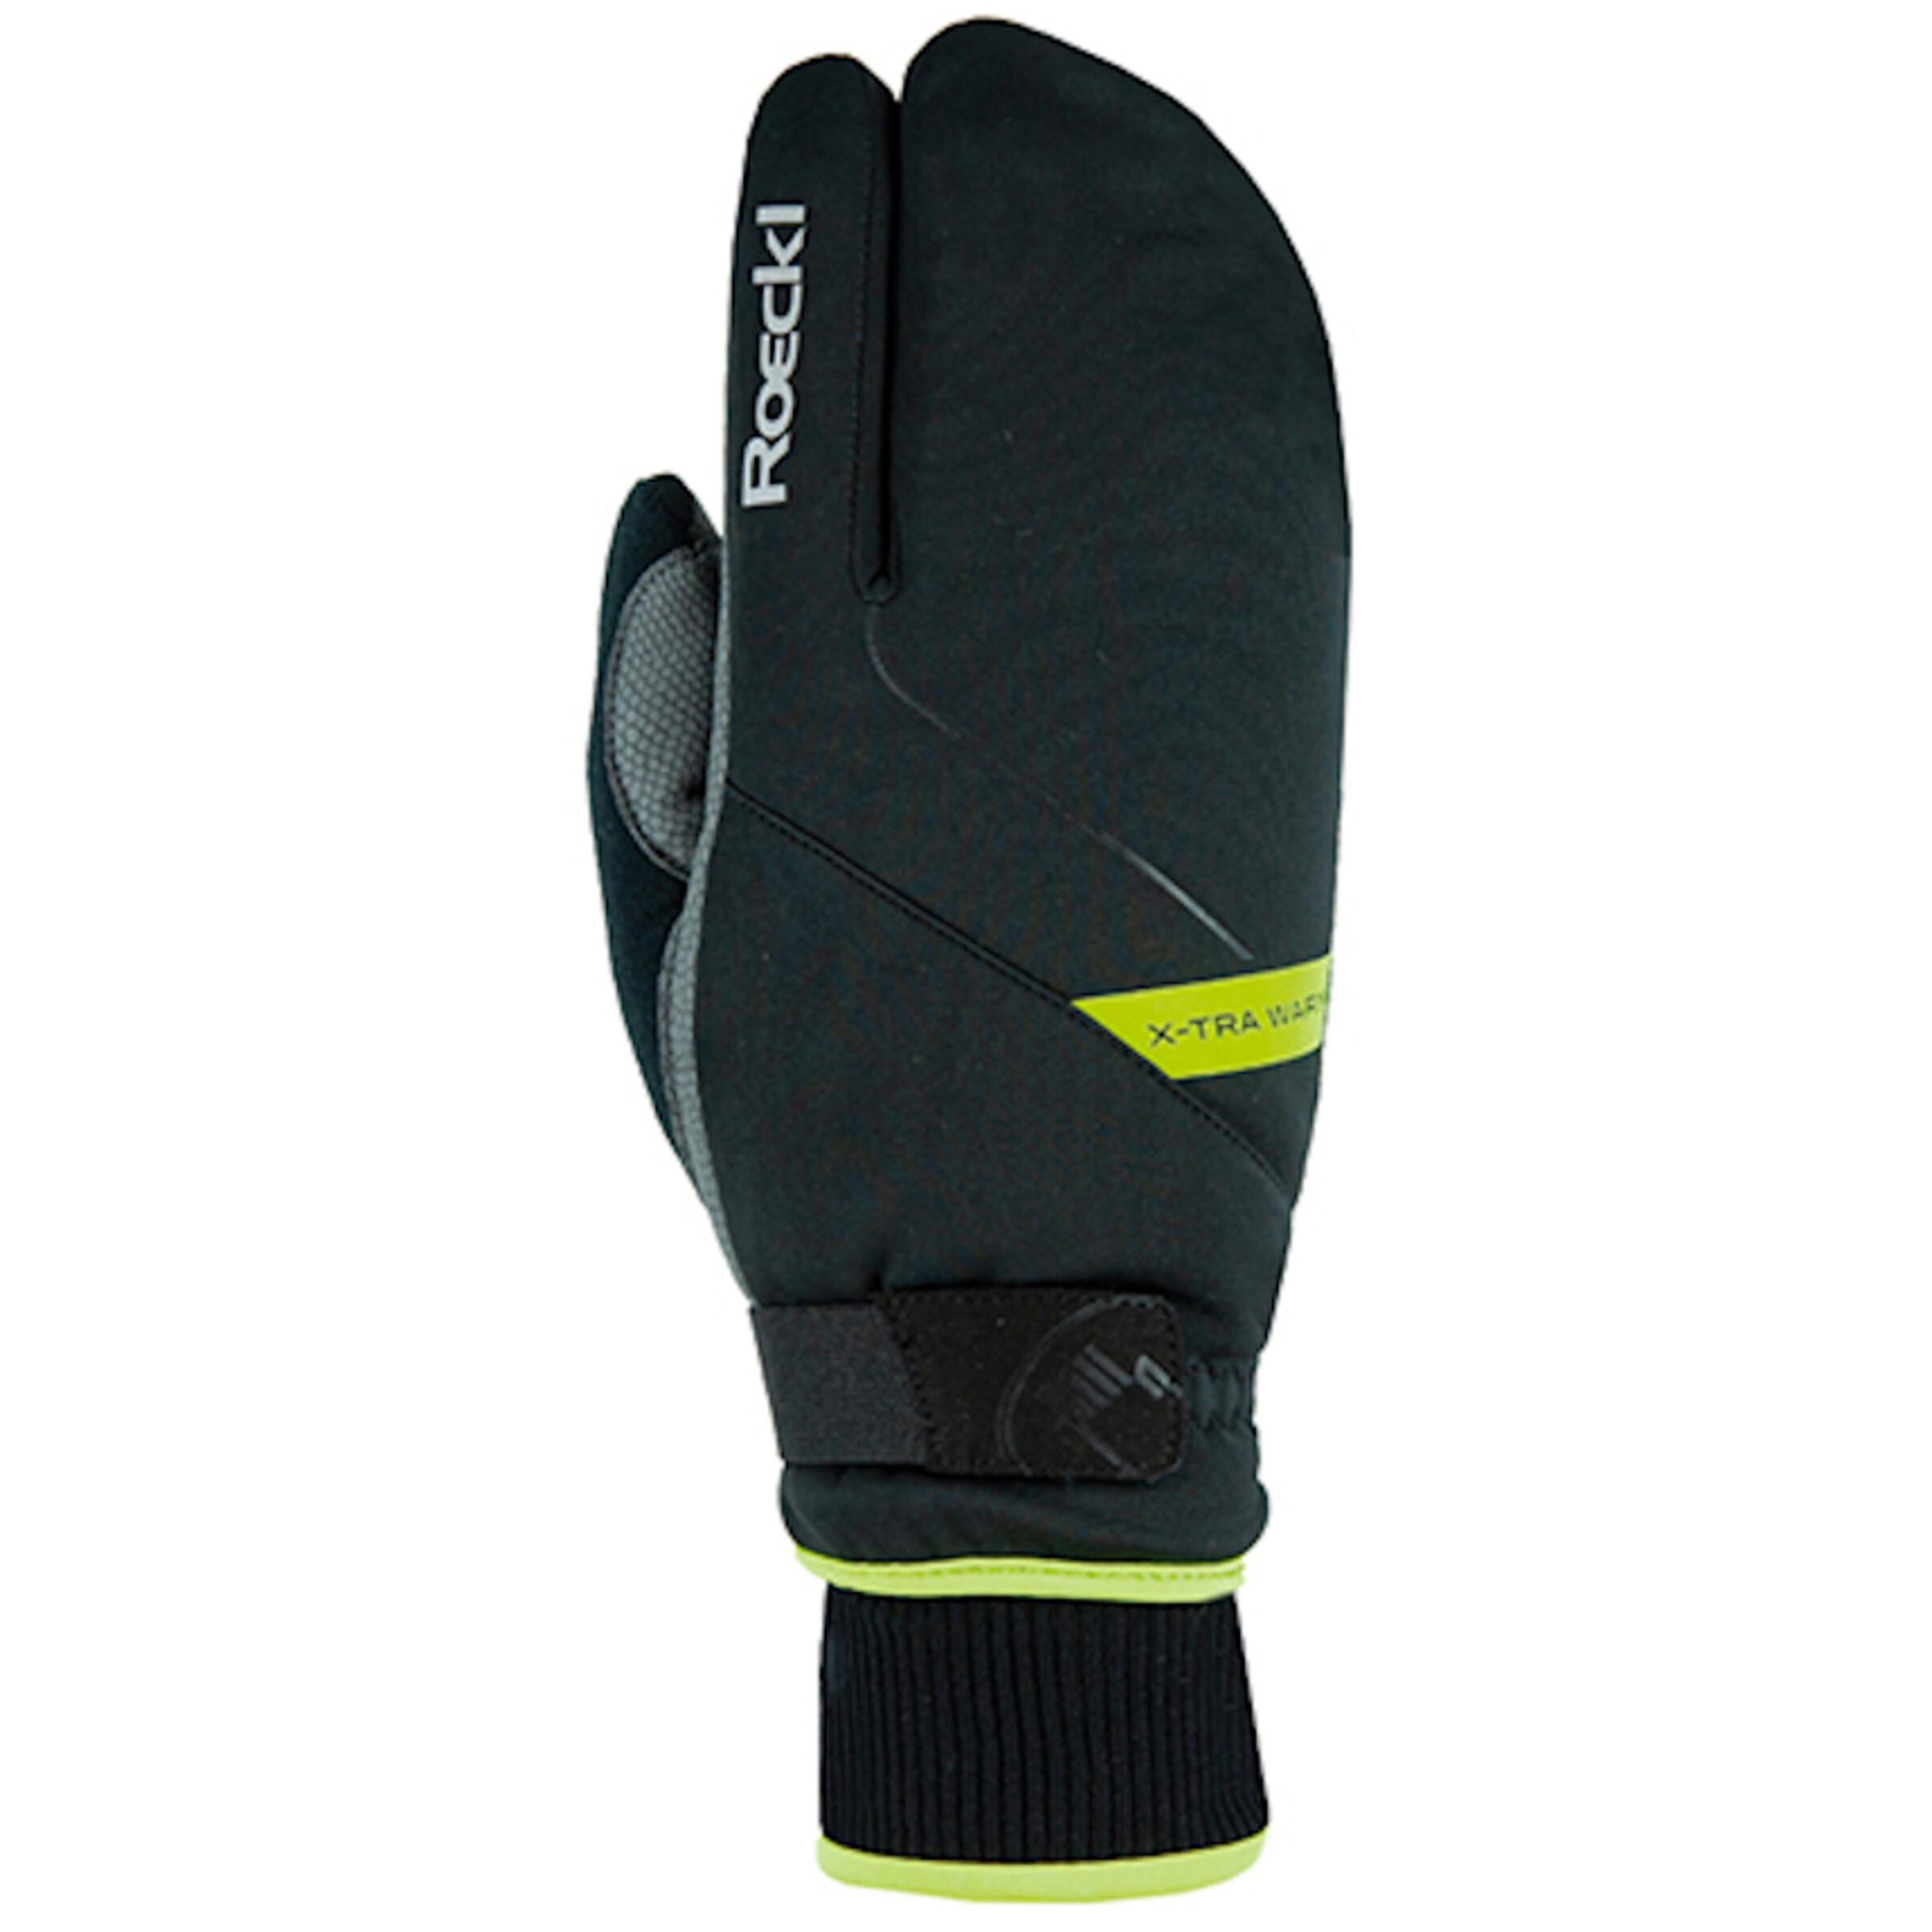 Roeckl Turin Trigger Handschuh